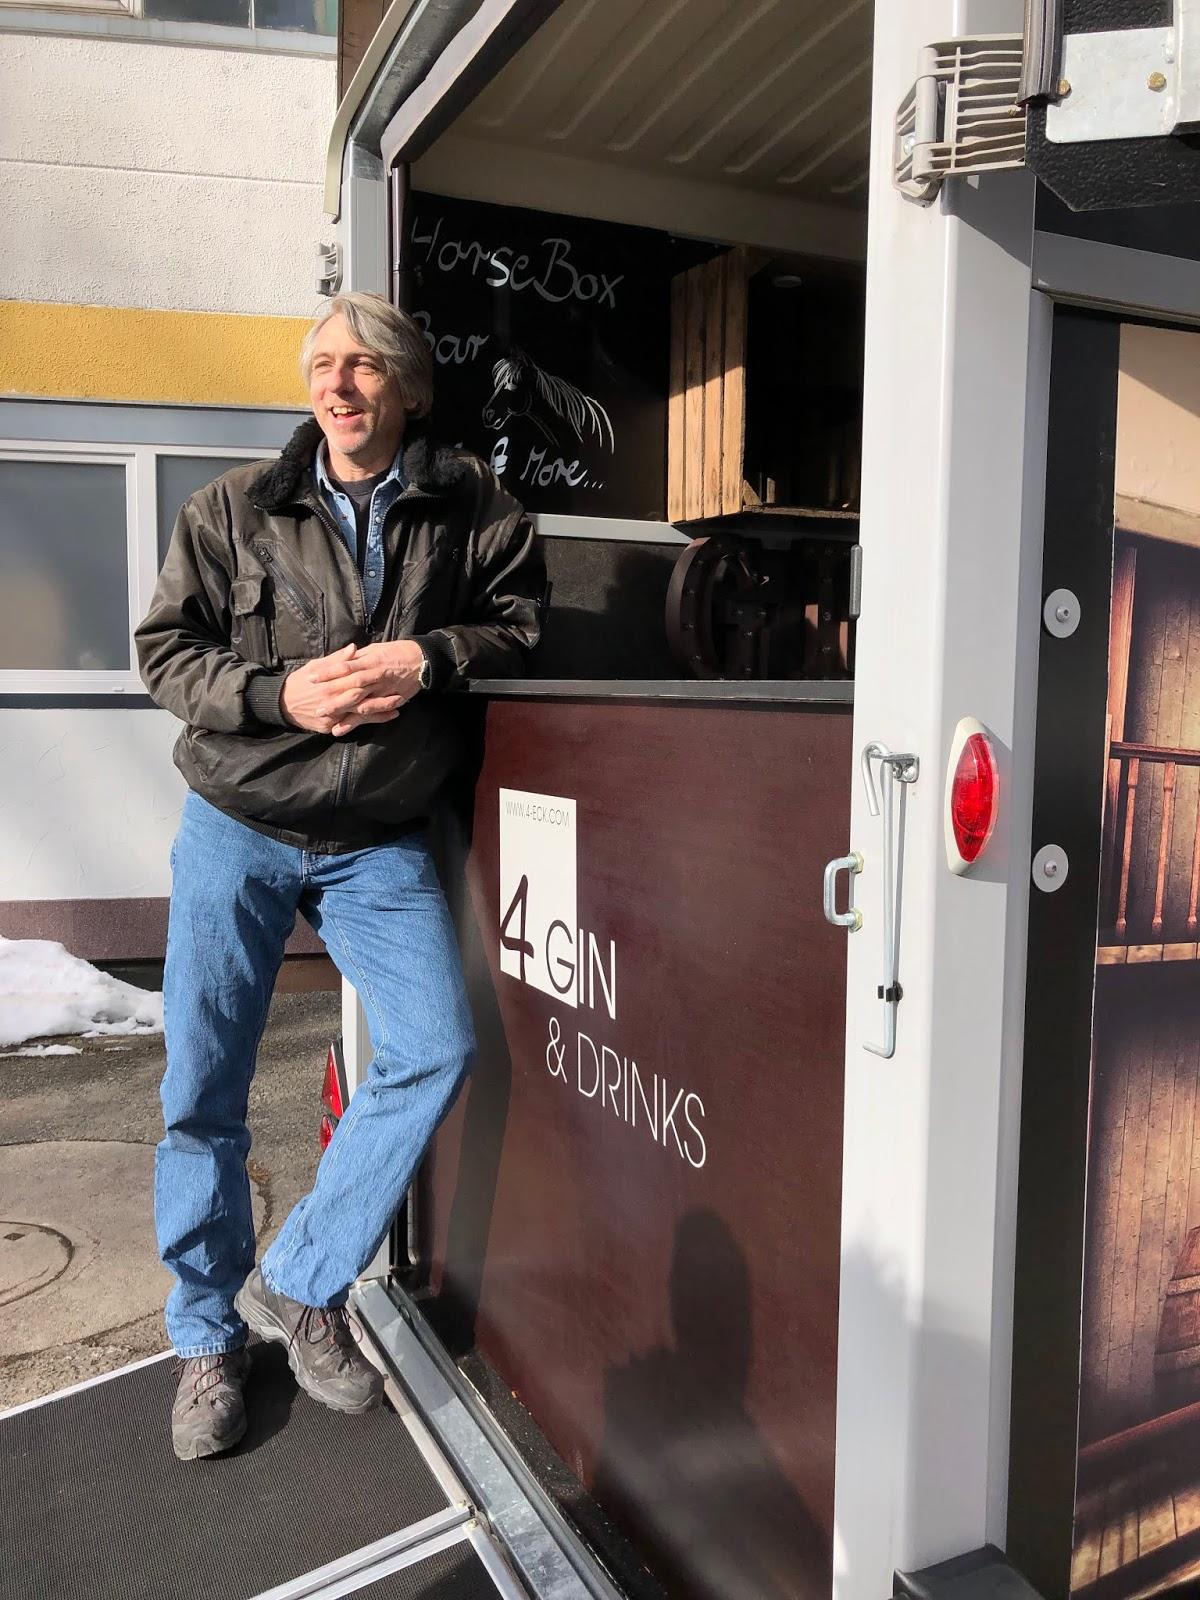 Konstrukteur Michael Dahl, 4 Gin and Drinks, Horseboxbar, Event-Bar, mobile Bar, Bayern, Garmisch-Partenkirchen, Gin-Bar, Oberammergau, König-Ludwig-Lauf